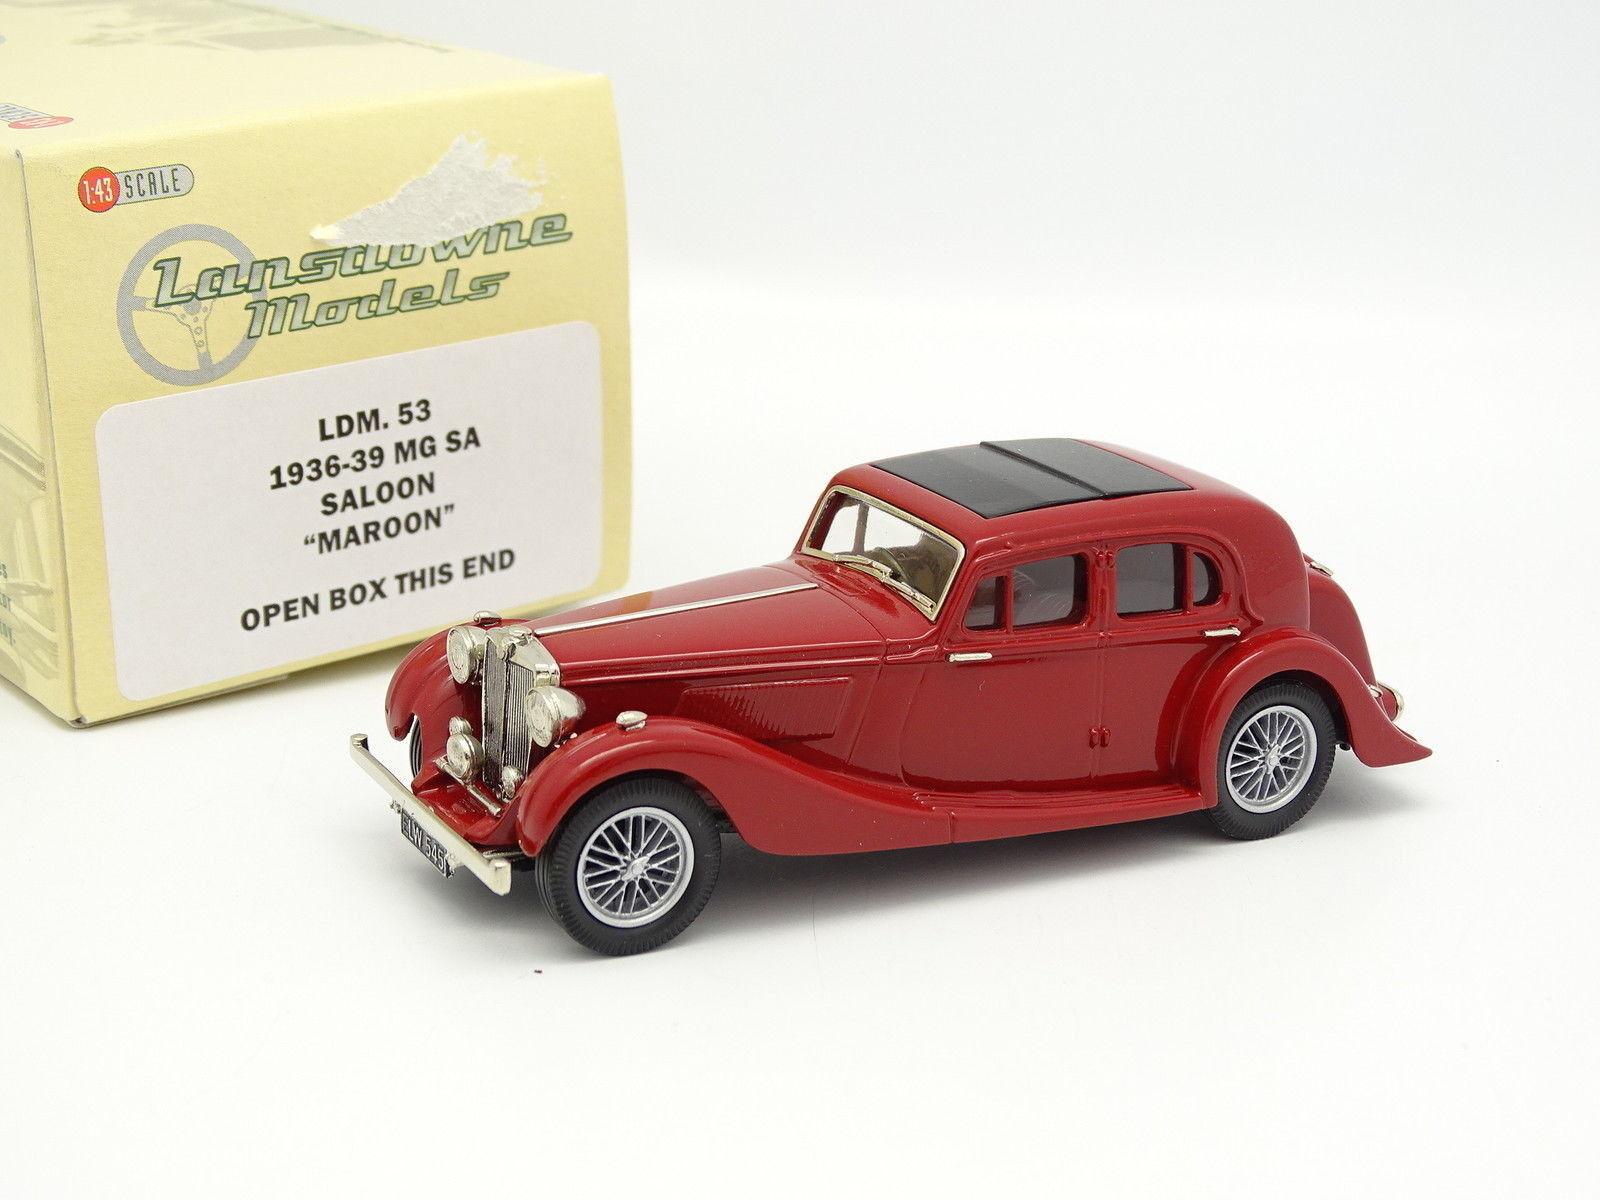 Cadeau de noel Lansdowne Models 1/43 1/43 1/43 MG SA Saloon Maroon 1936 | Sale Online  81db4c